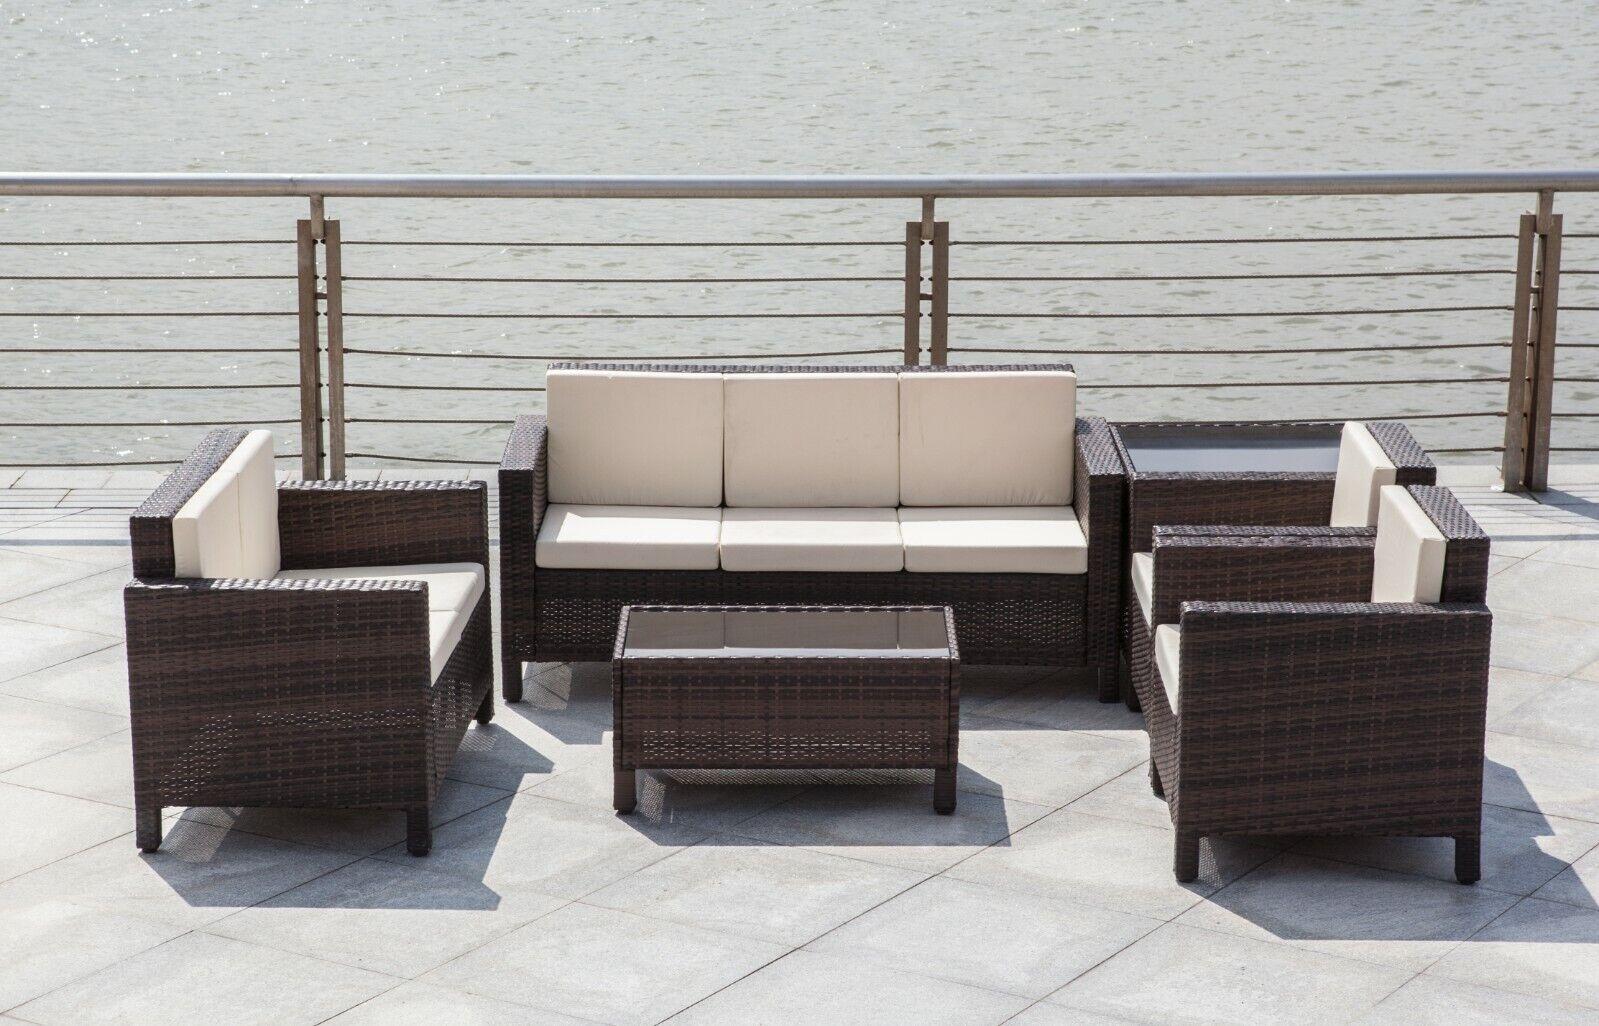 Garden Furniture - Rattan Garden Furniture Lounge Set Black Brown Outdoor Sofa Chair Corner Patio